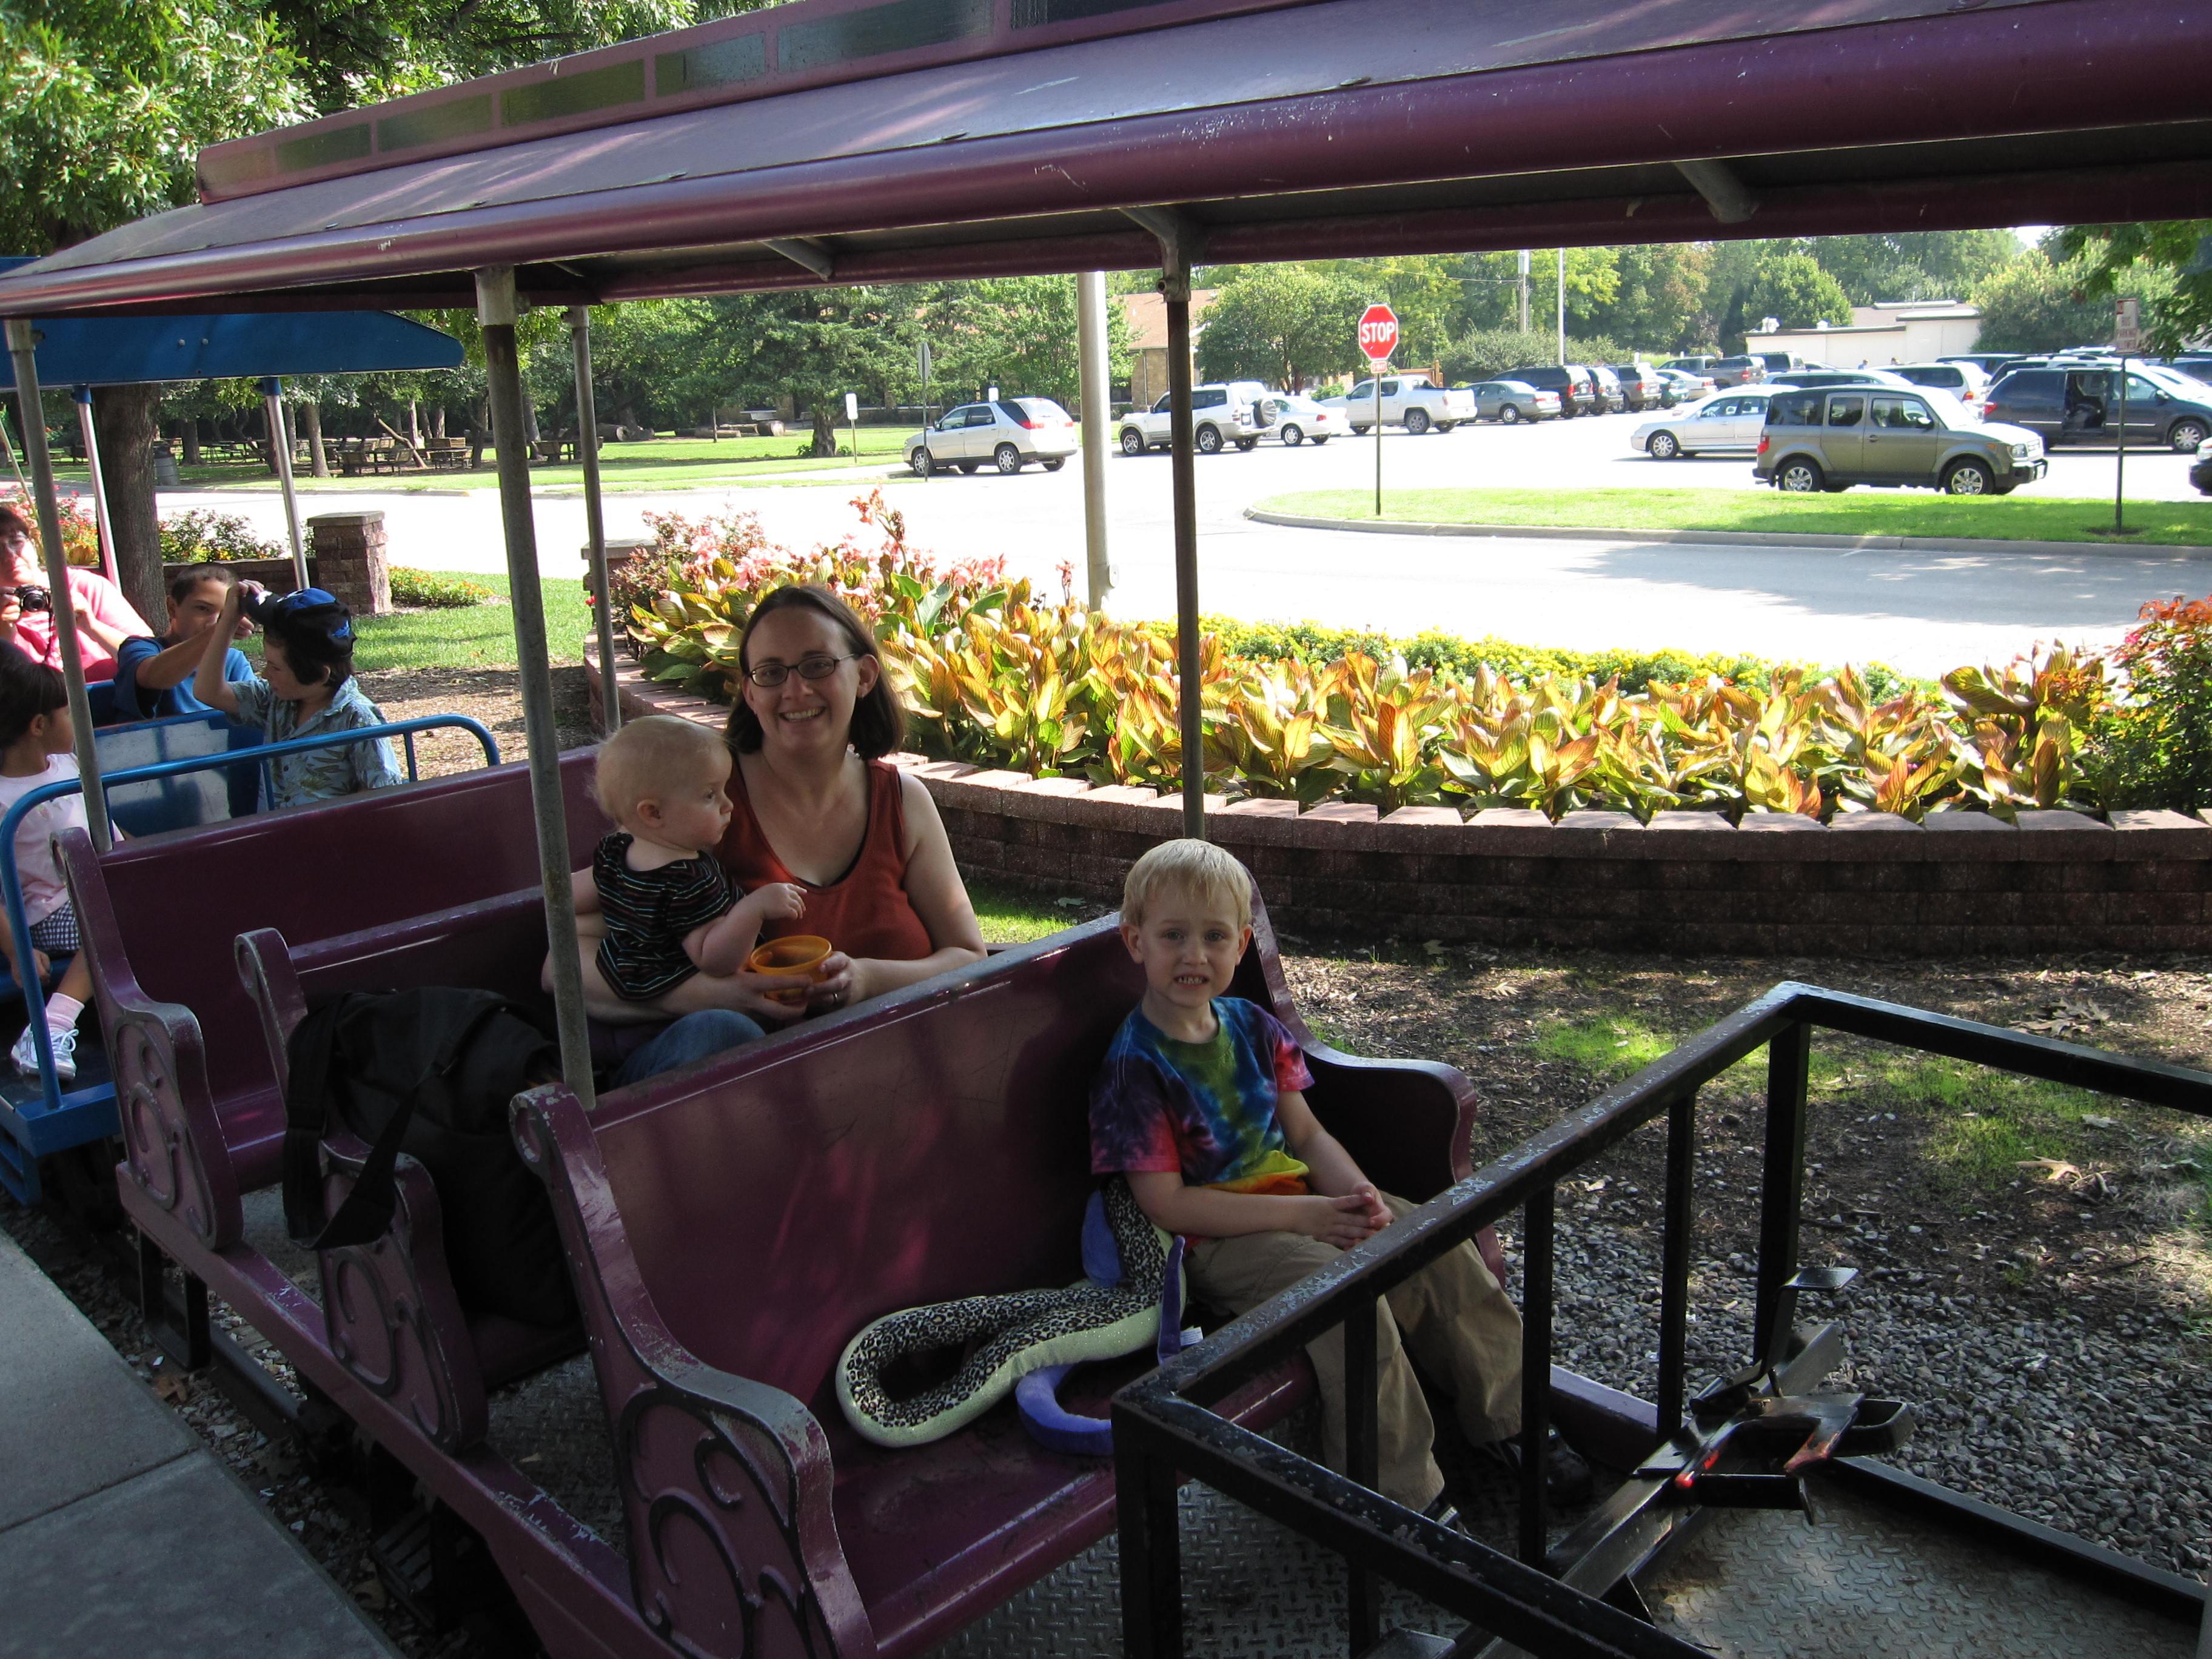 gage park mini train